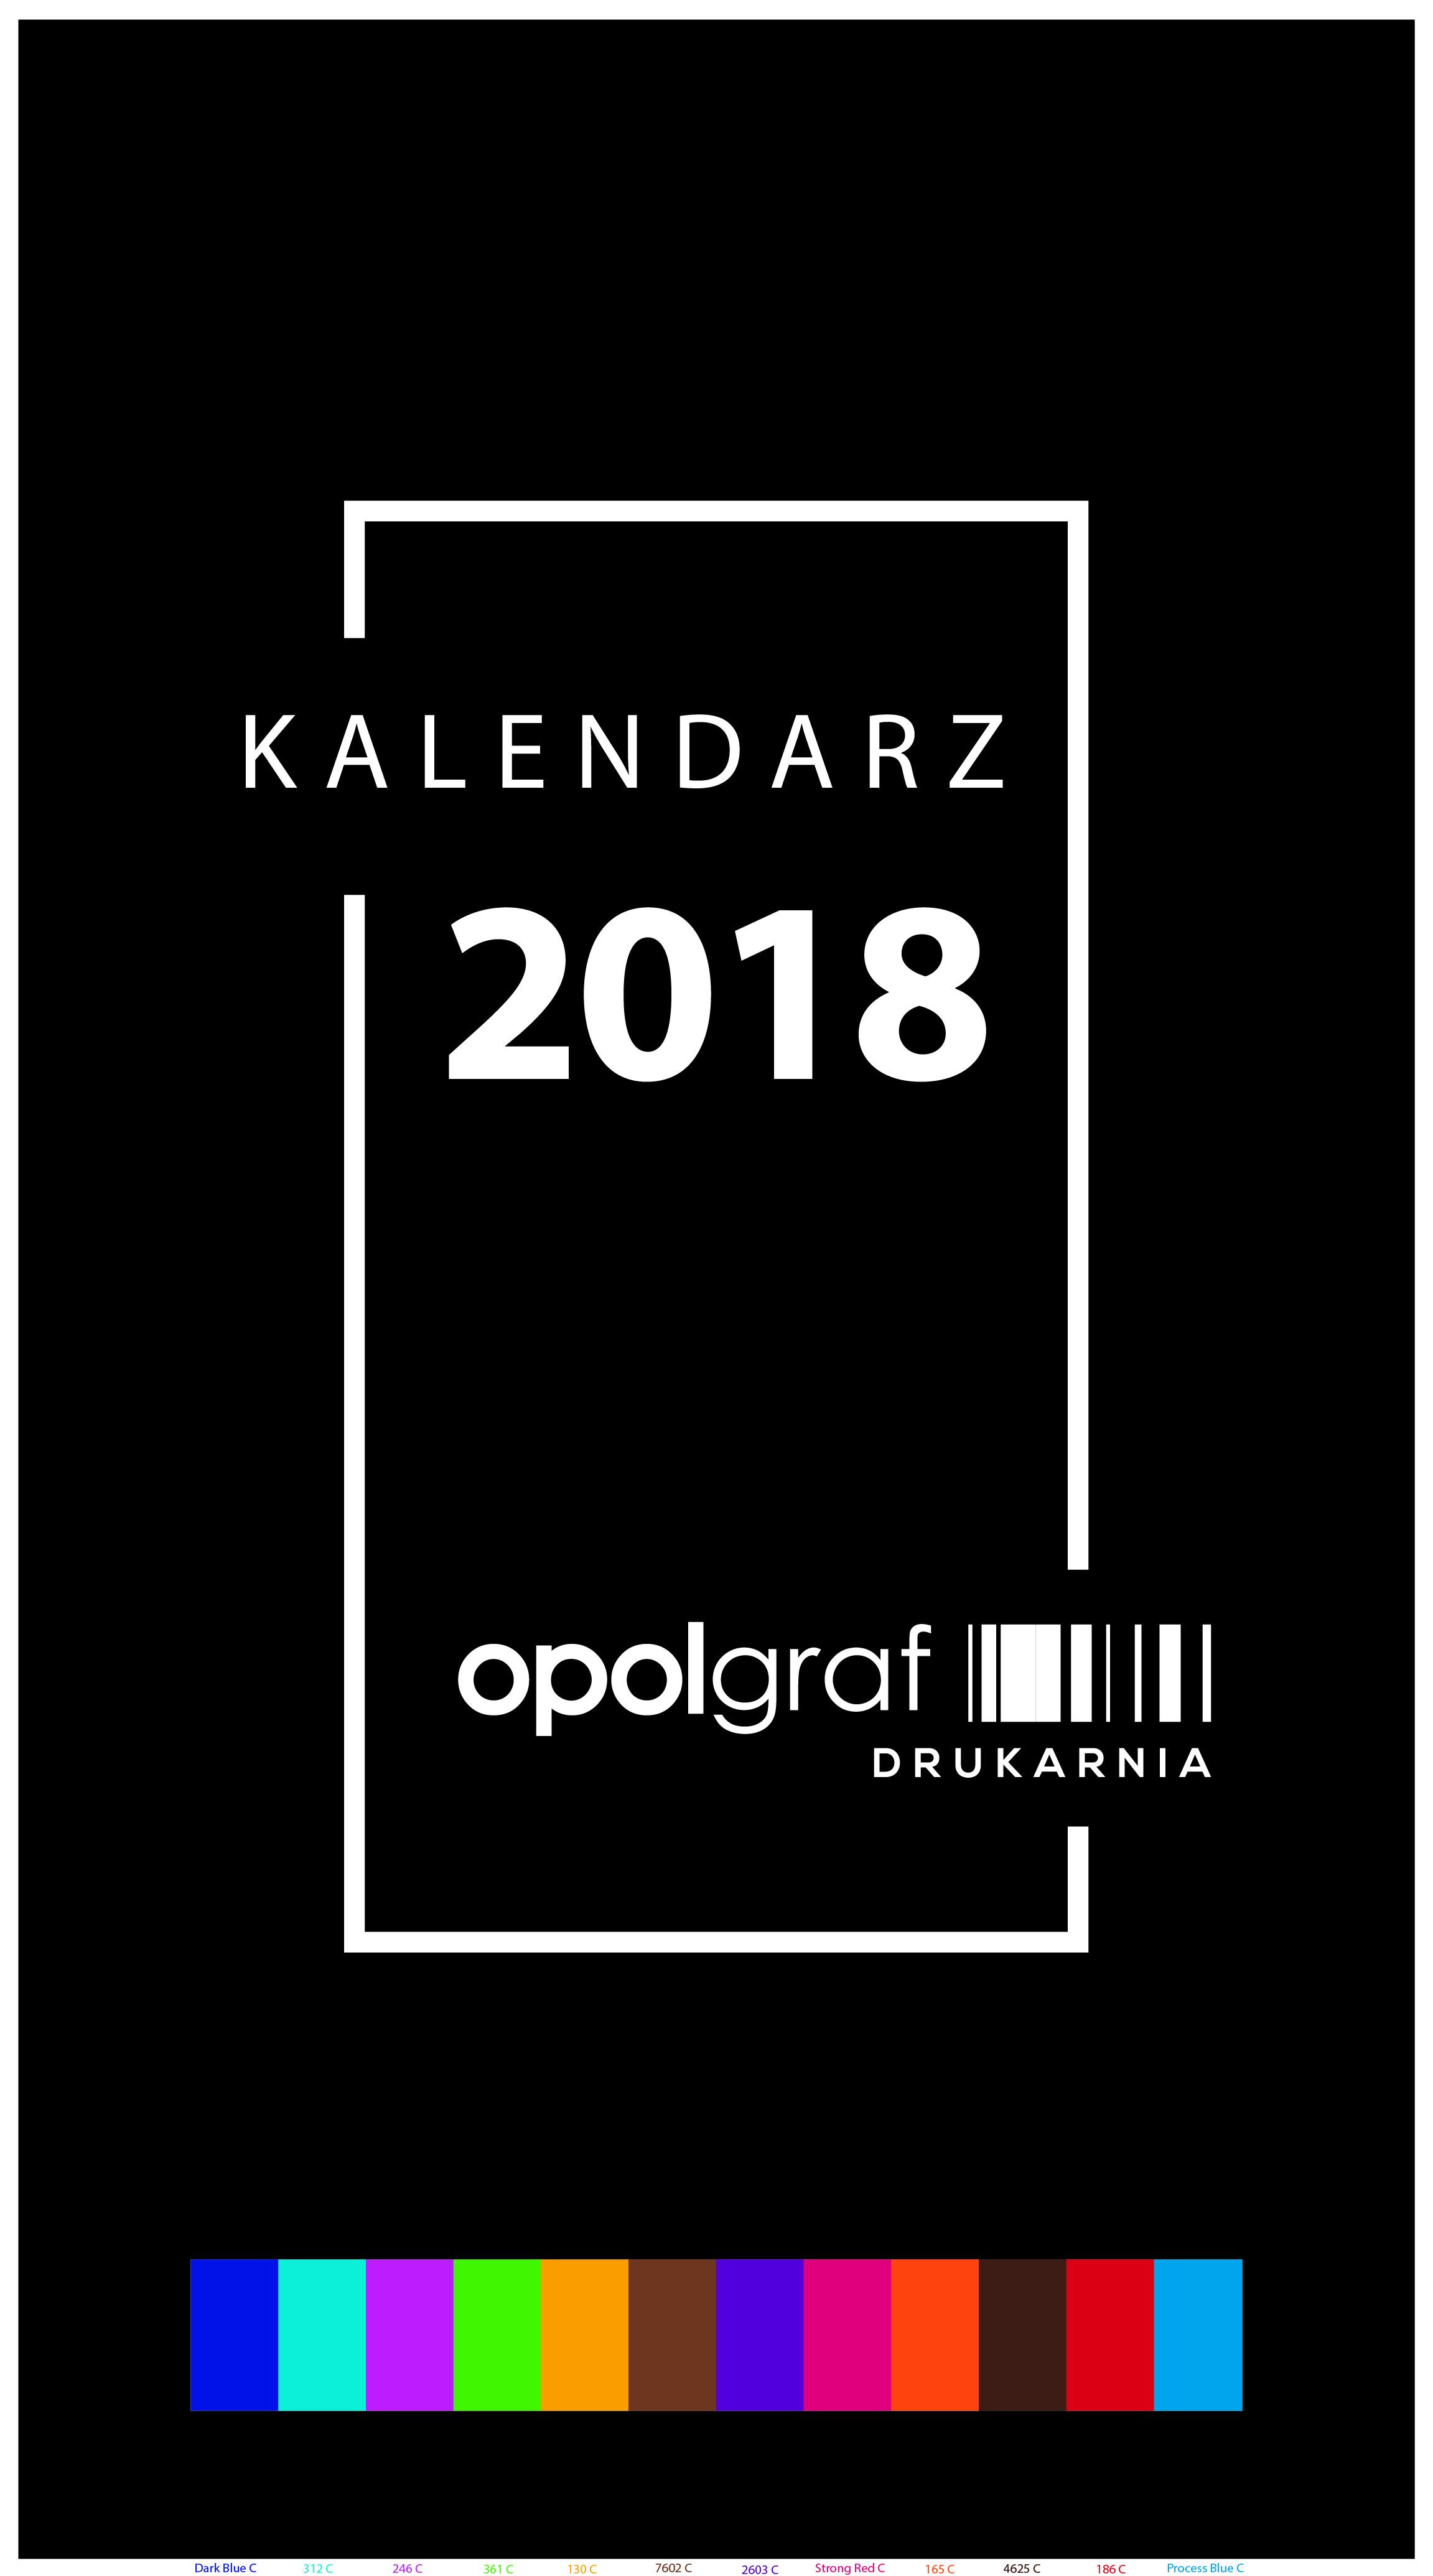 kalendarz-opolgraf-2018-pantone-350-x-660_okladka-przod